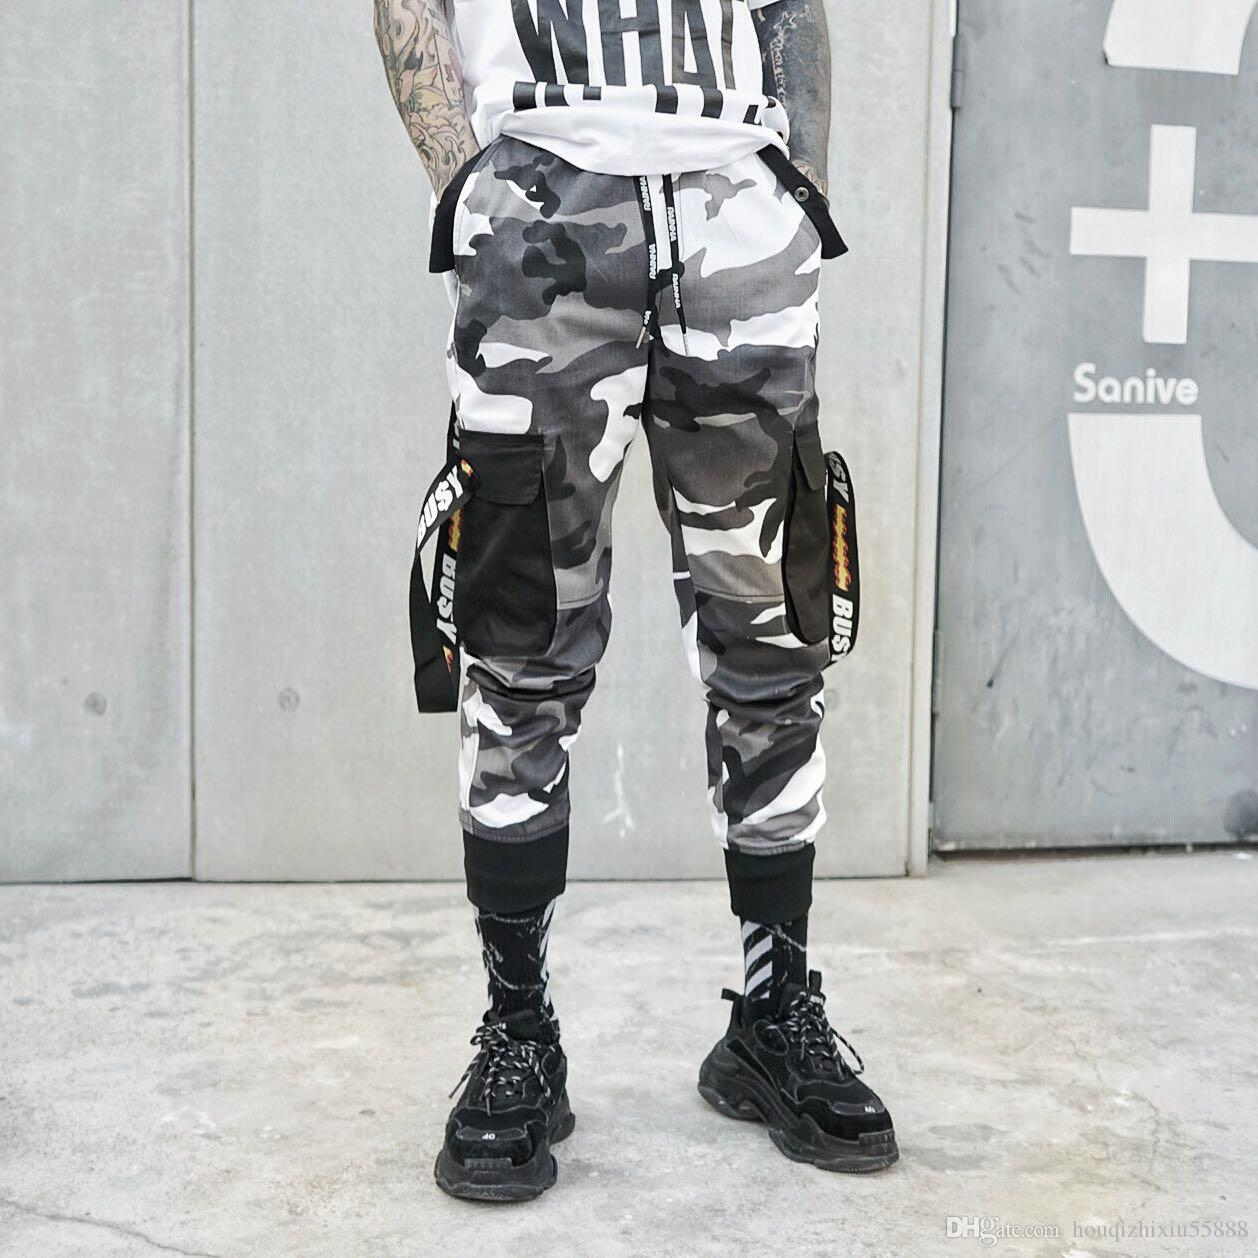 Compre Pantalones De Camuflaje Hombres Moda Algodón Streetwear Pantalones  Elásticos Hip Hop Skateboard Joggers Masculinos Pantalones De Chándal EE.  UU. 1d1b2c6bb36